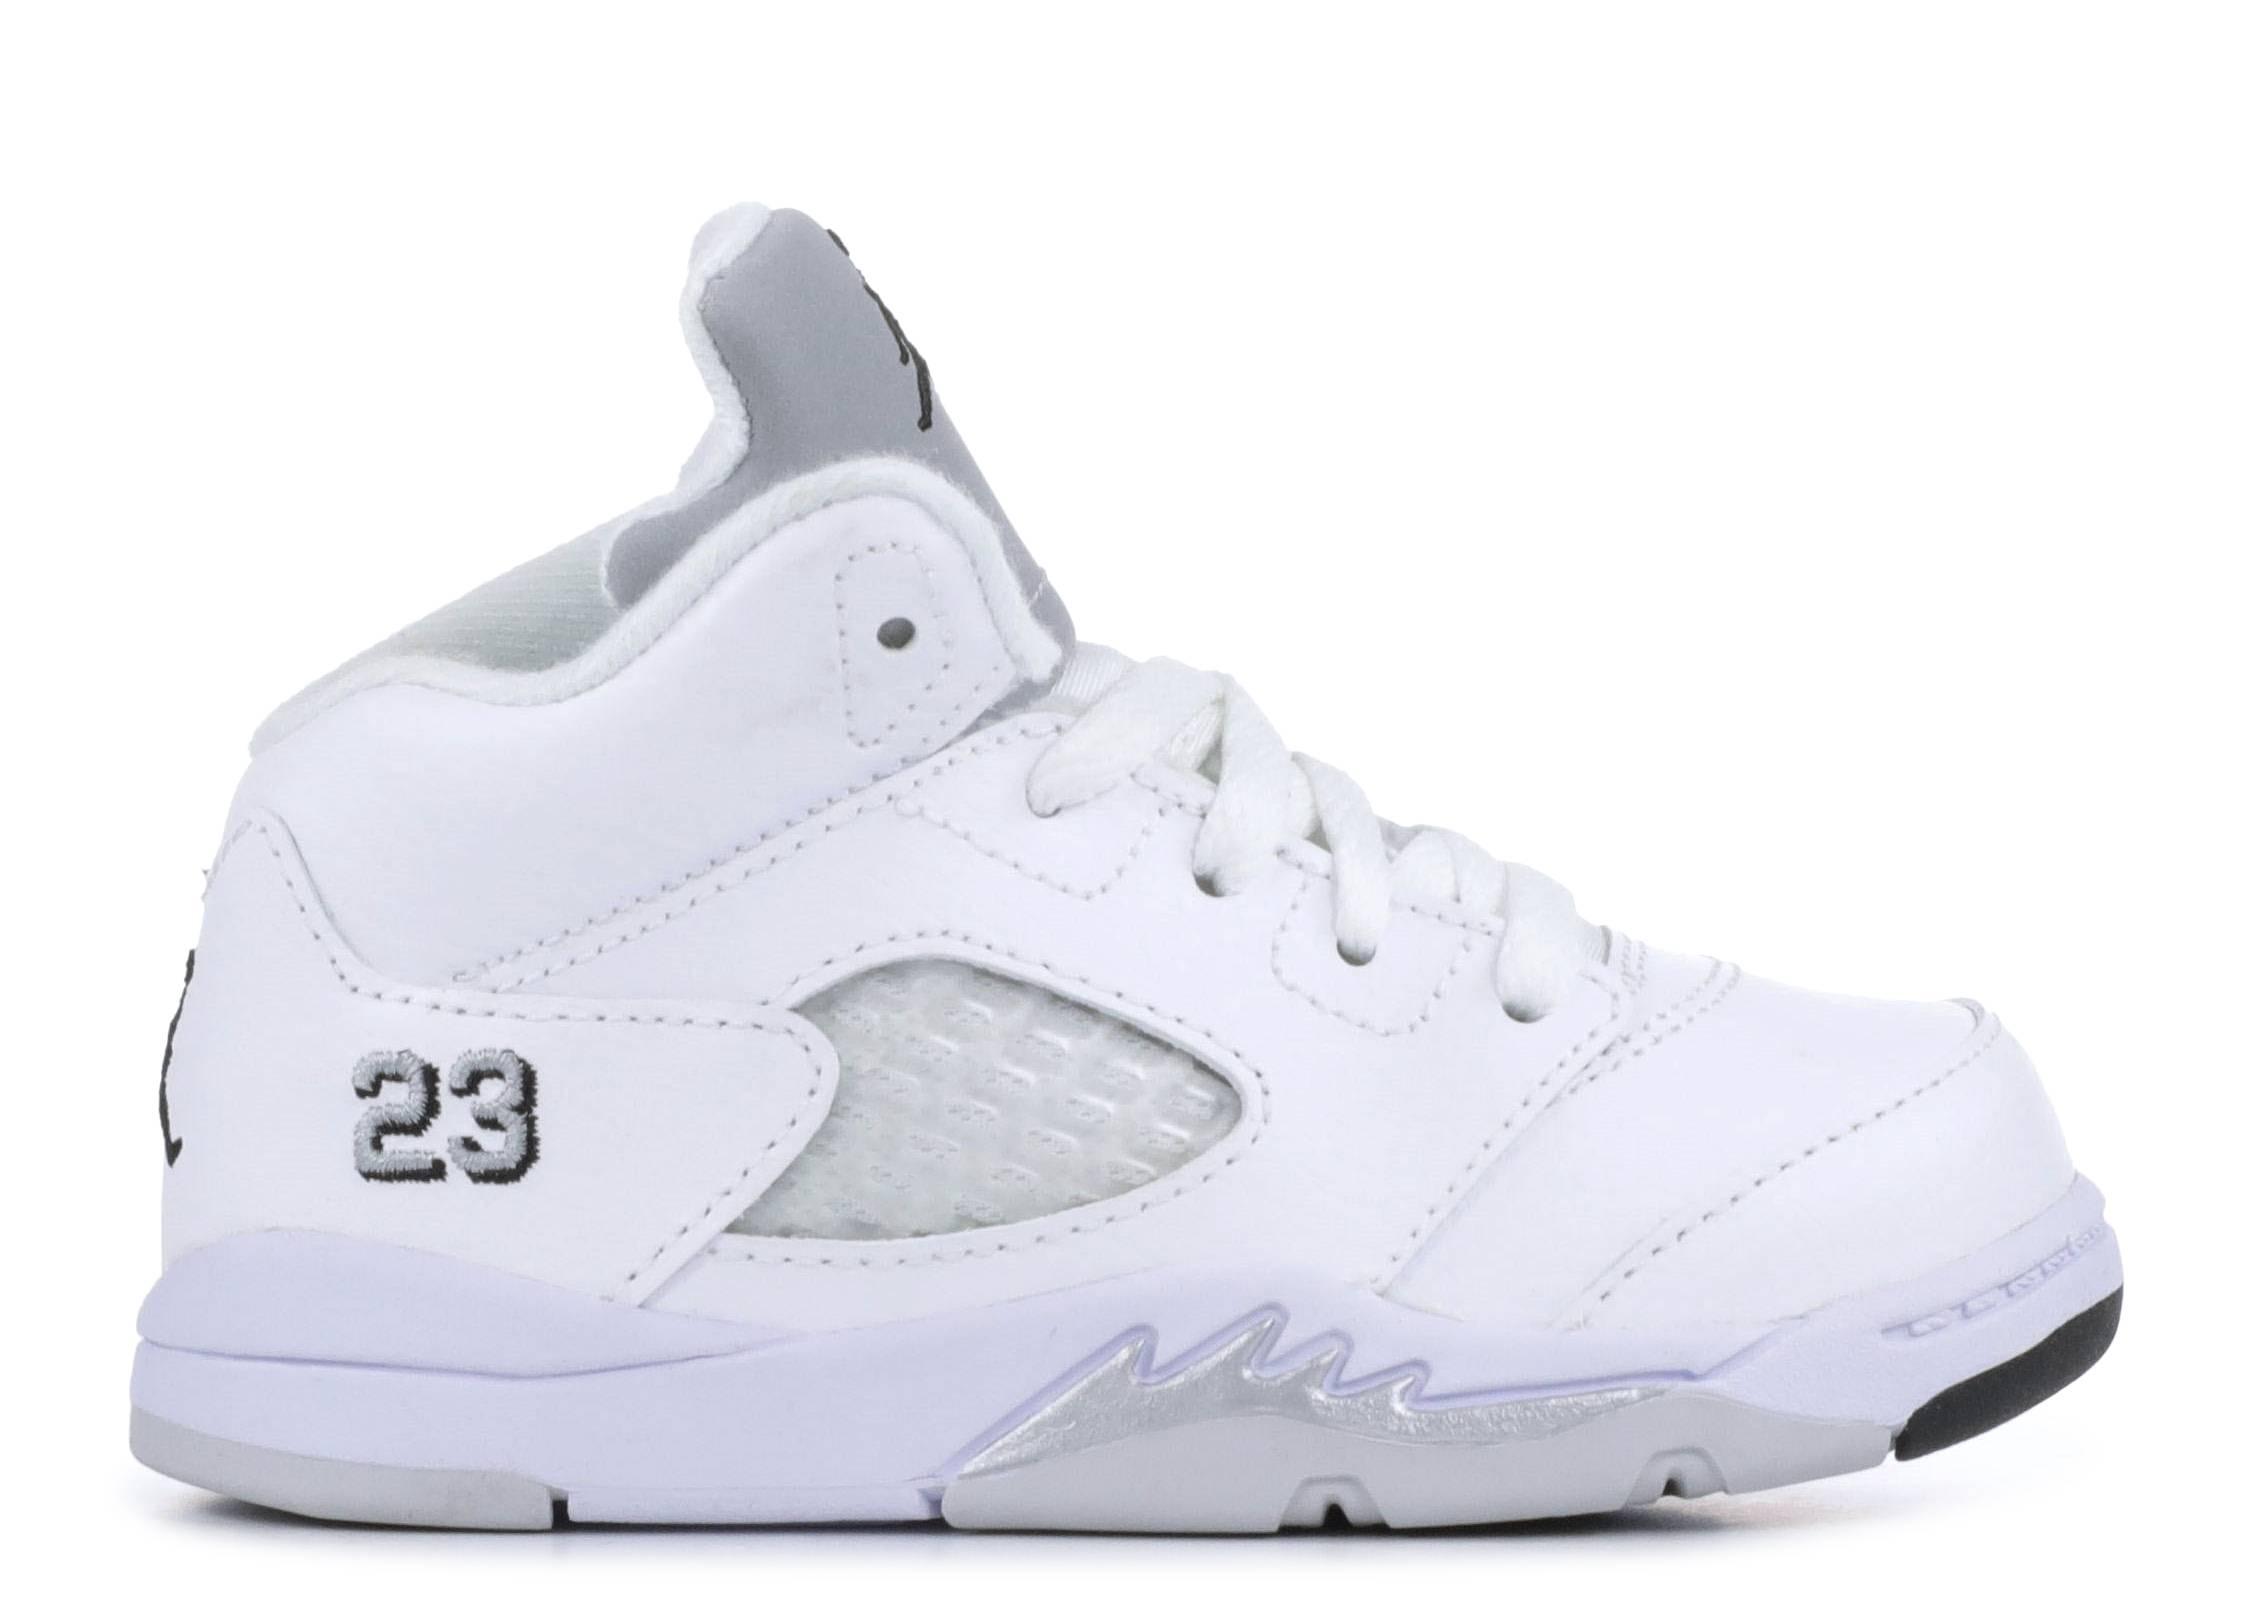 097d2a828fcb8d Jordan Retro 5 - Air Jordan - 440890 130 - white metallic silver ...